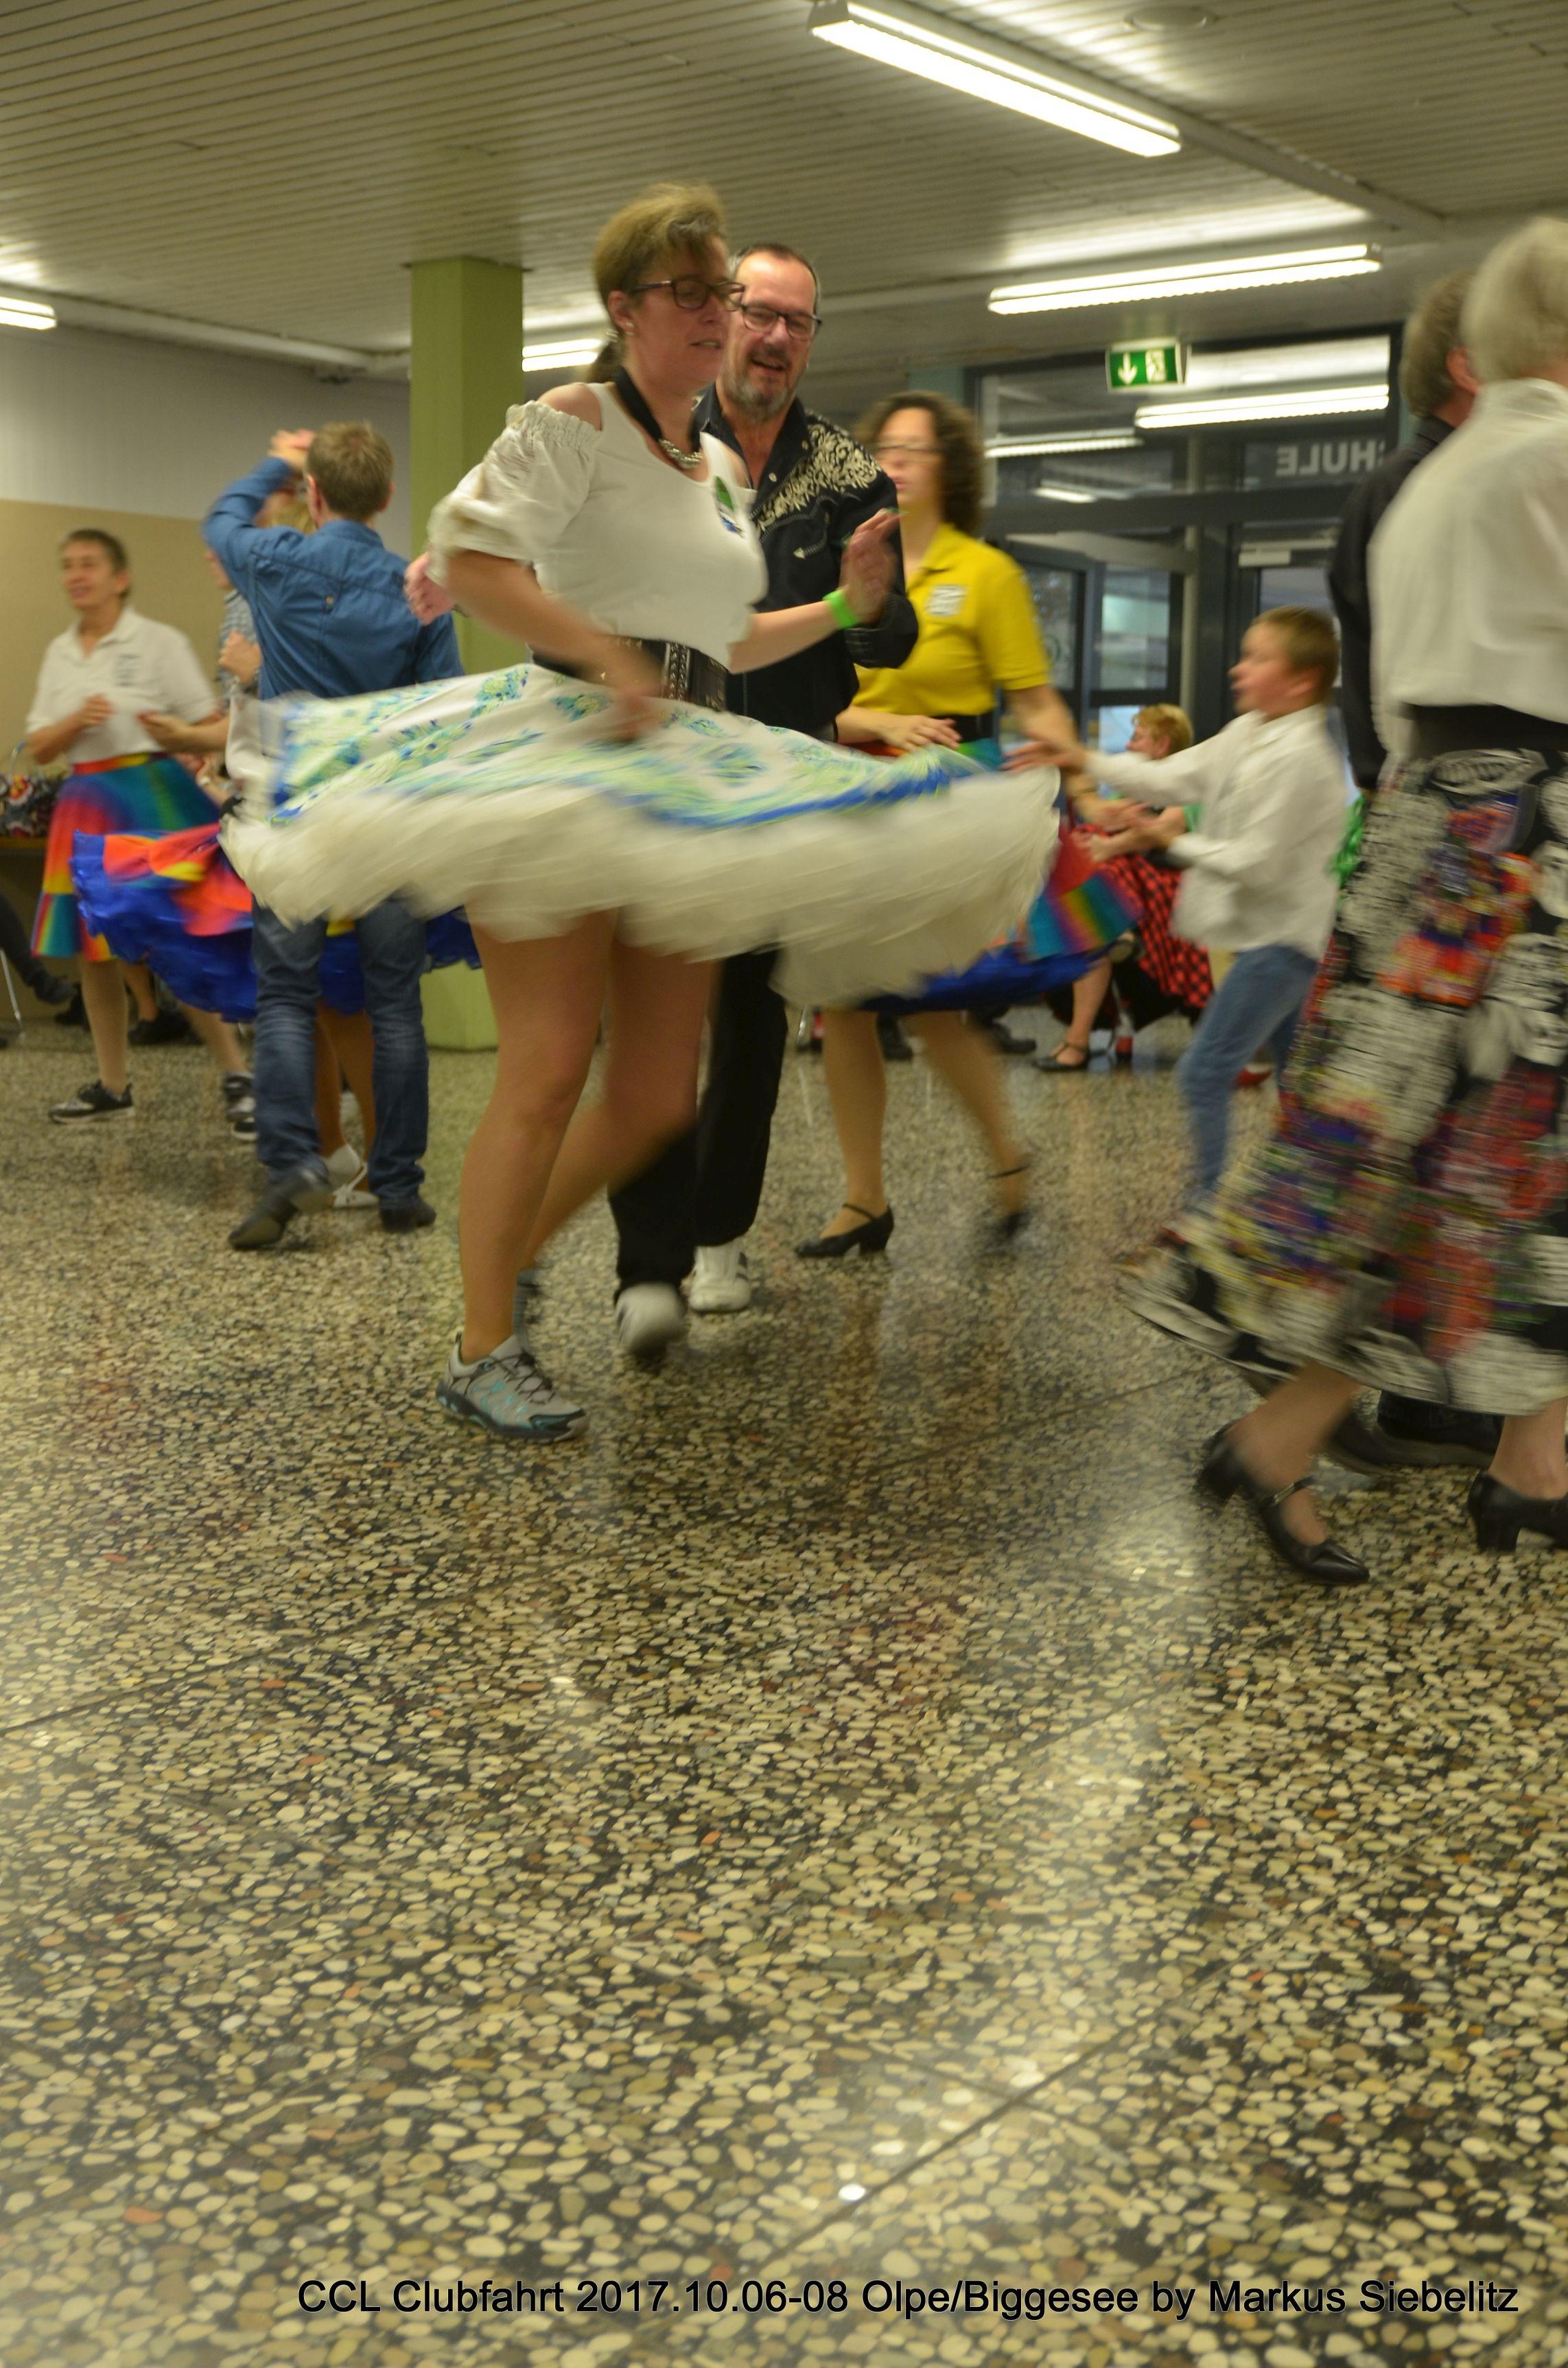 CCL Clubfahrt 2017.10.06-08 Biggesee (57)